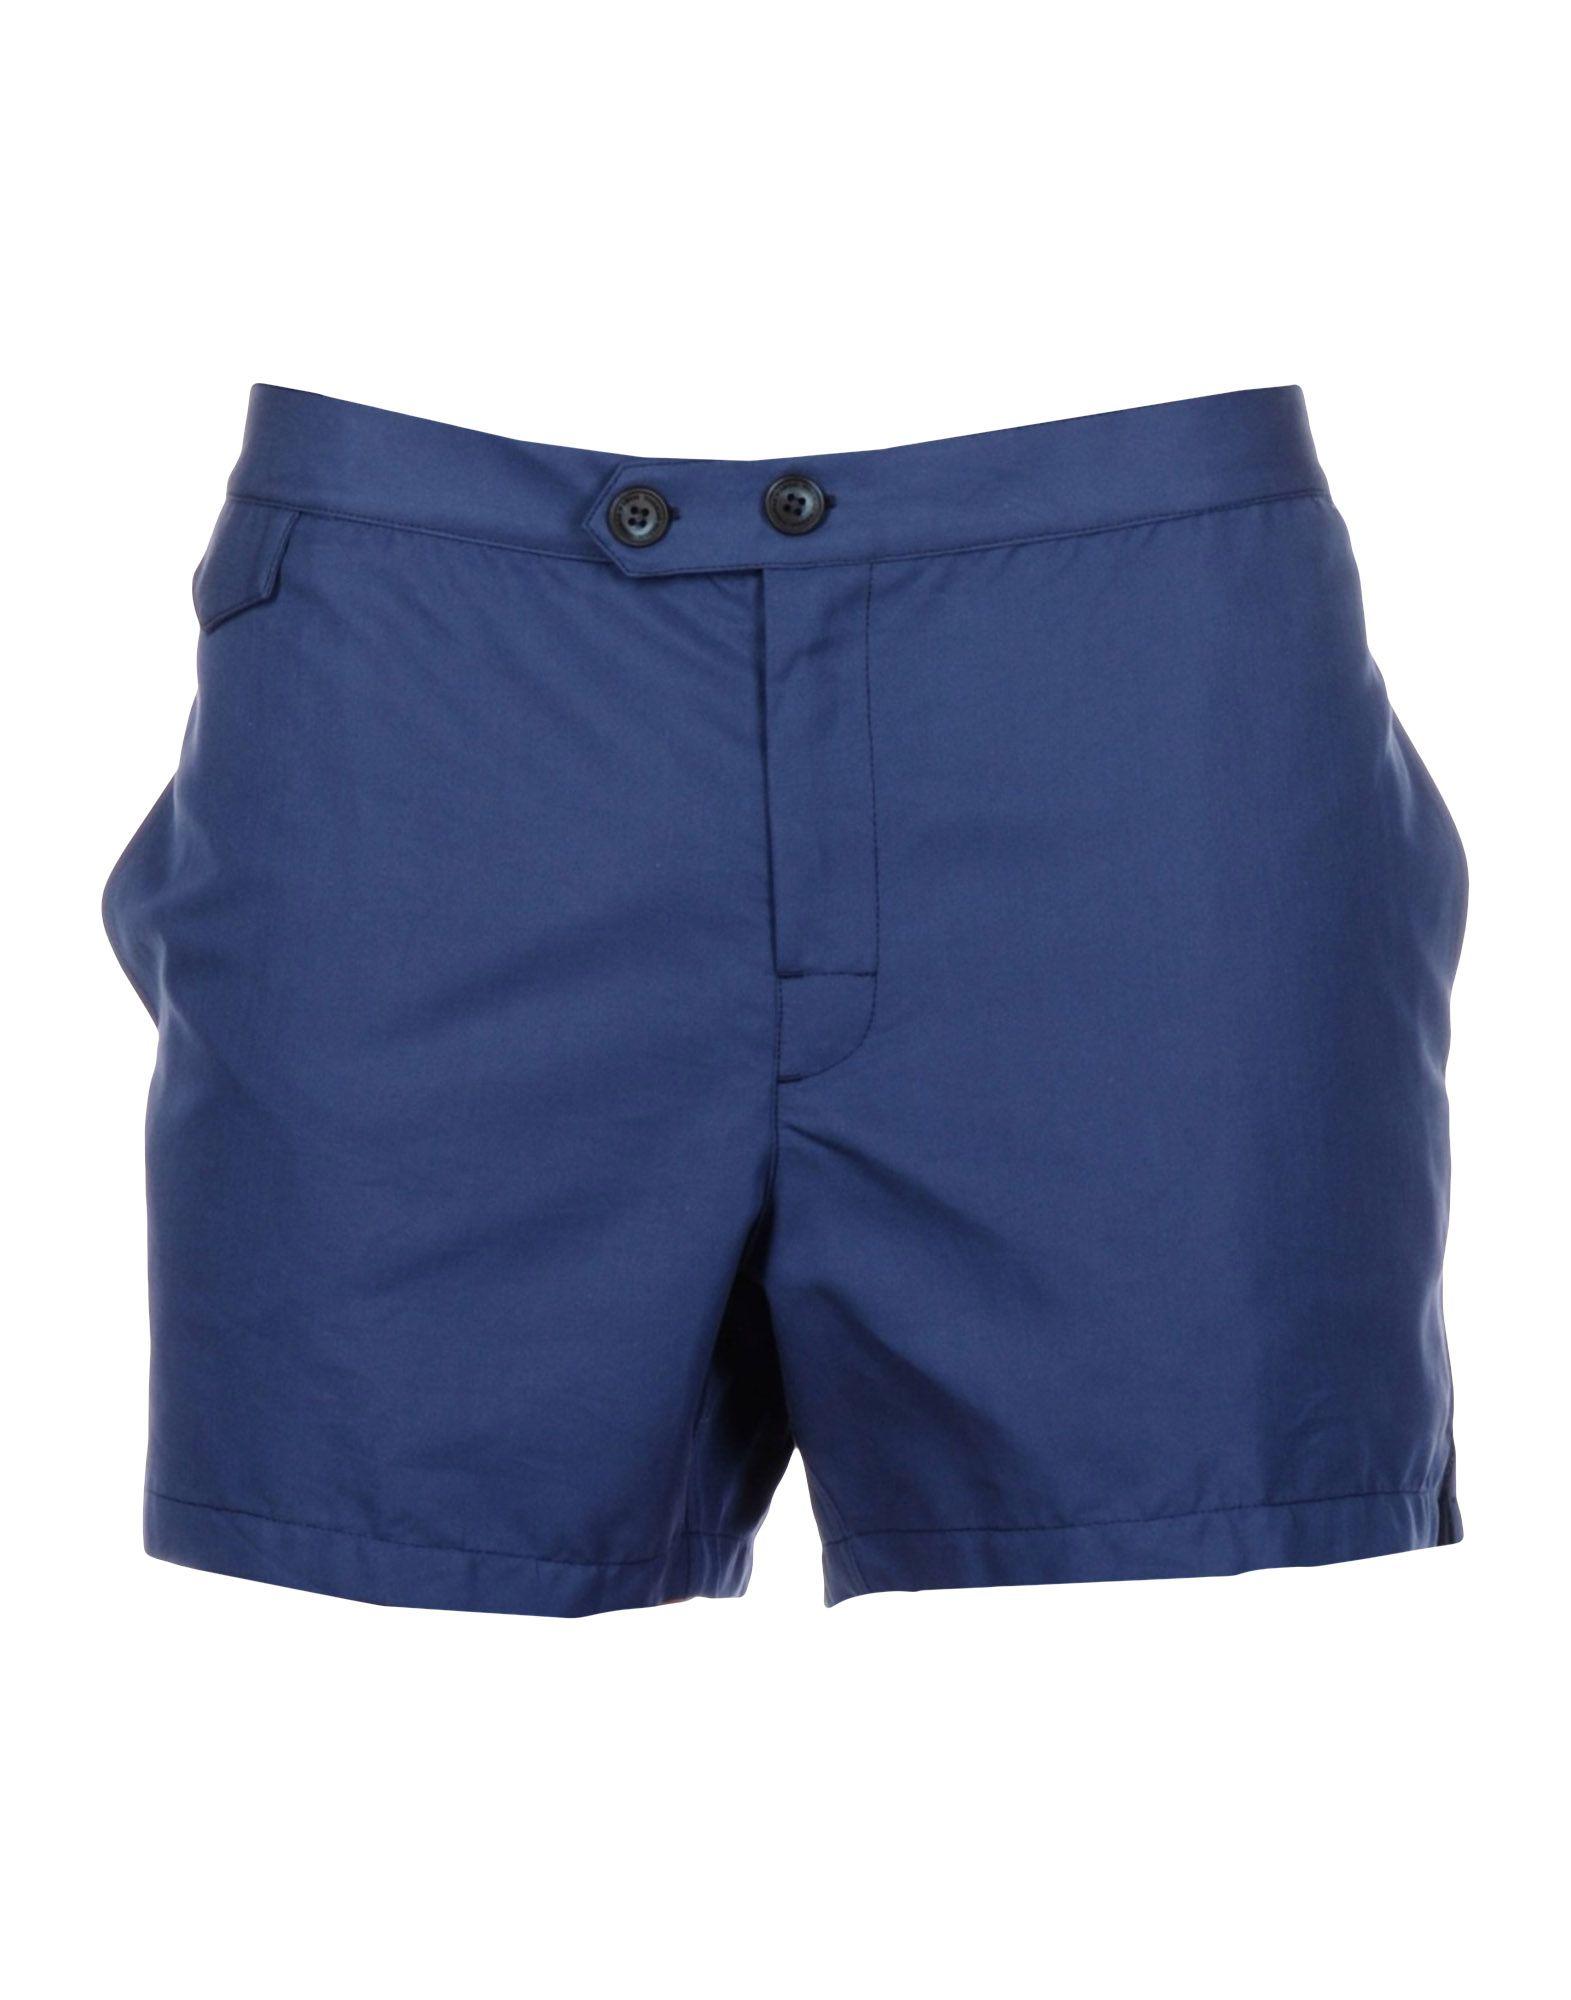 THOMAS MASON Swim Shorts in Slate Blue